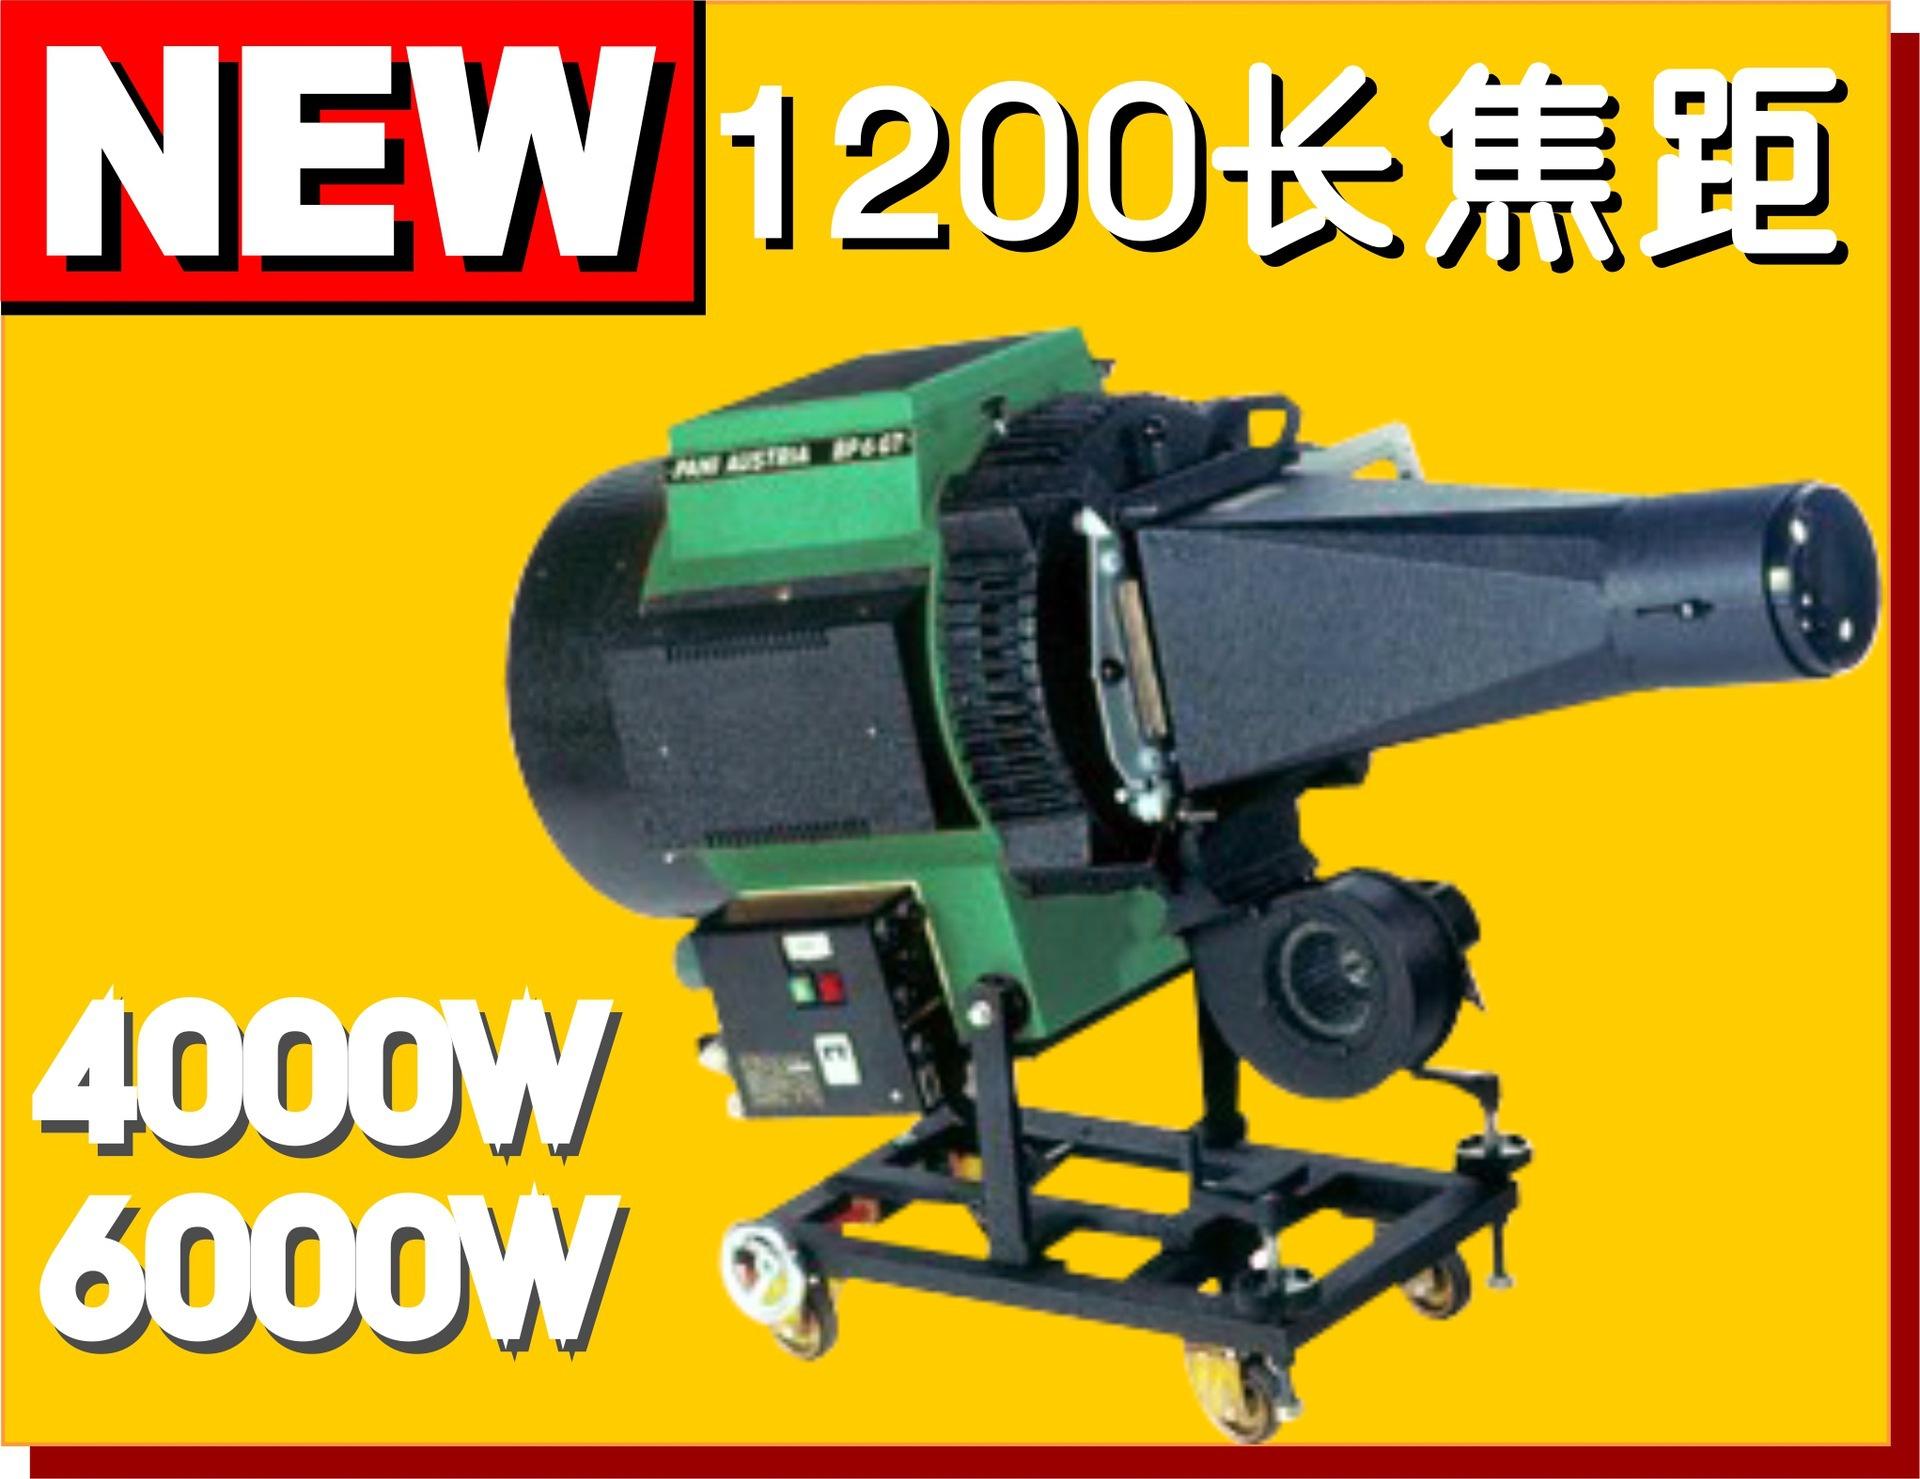 1200MM中长焦距投影机型